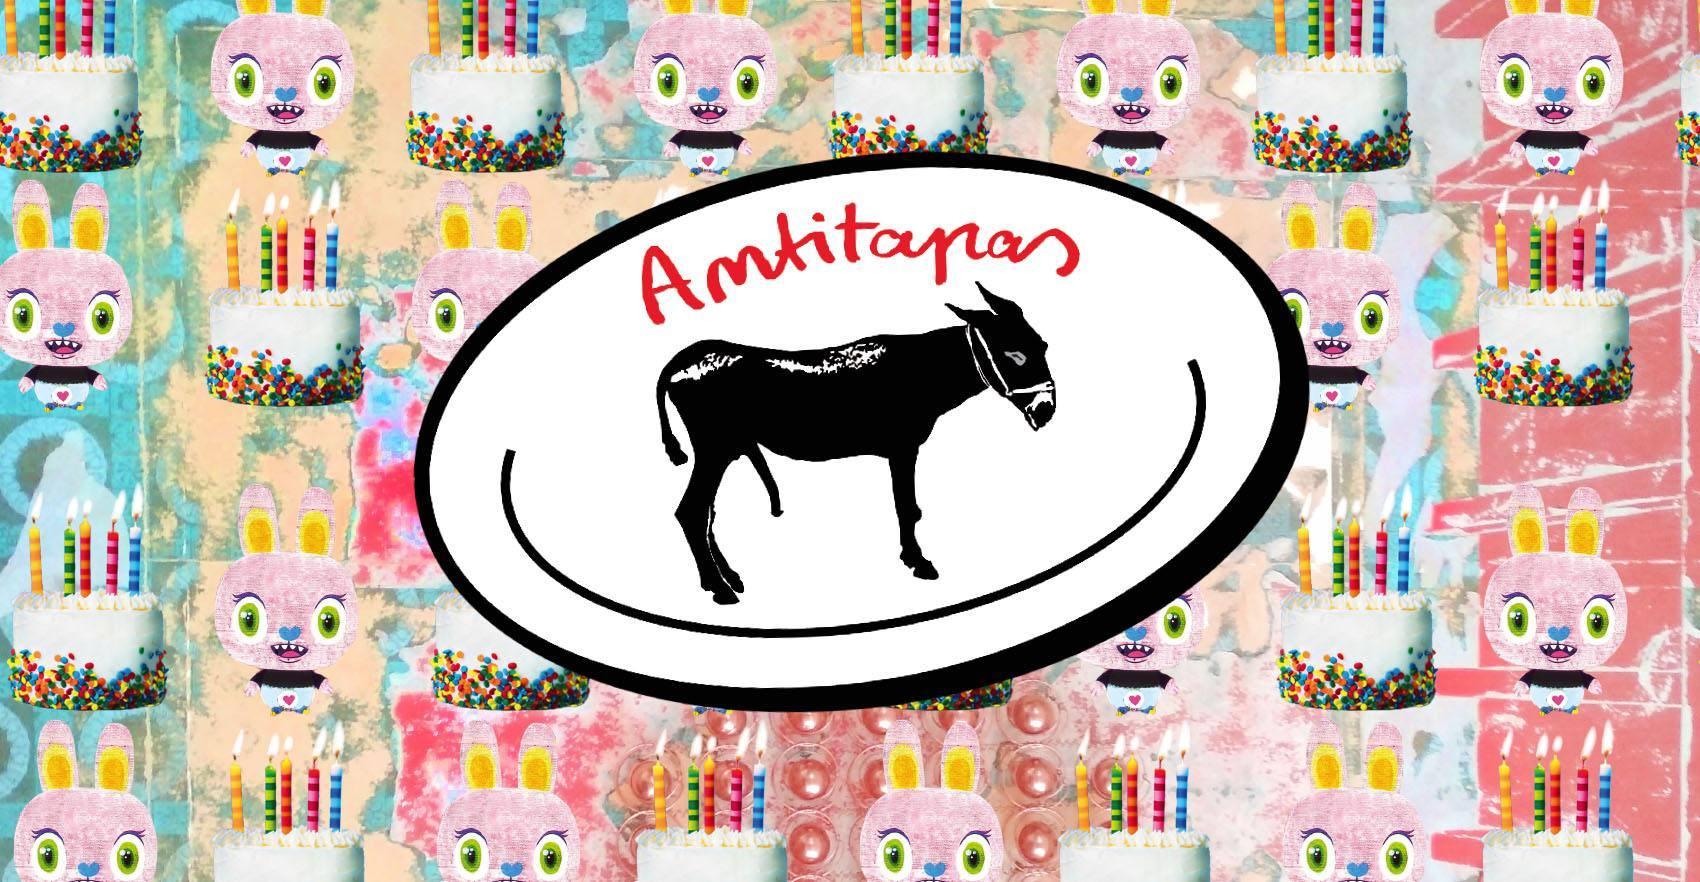 28. Antitapas 10th Anniversary